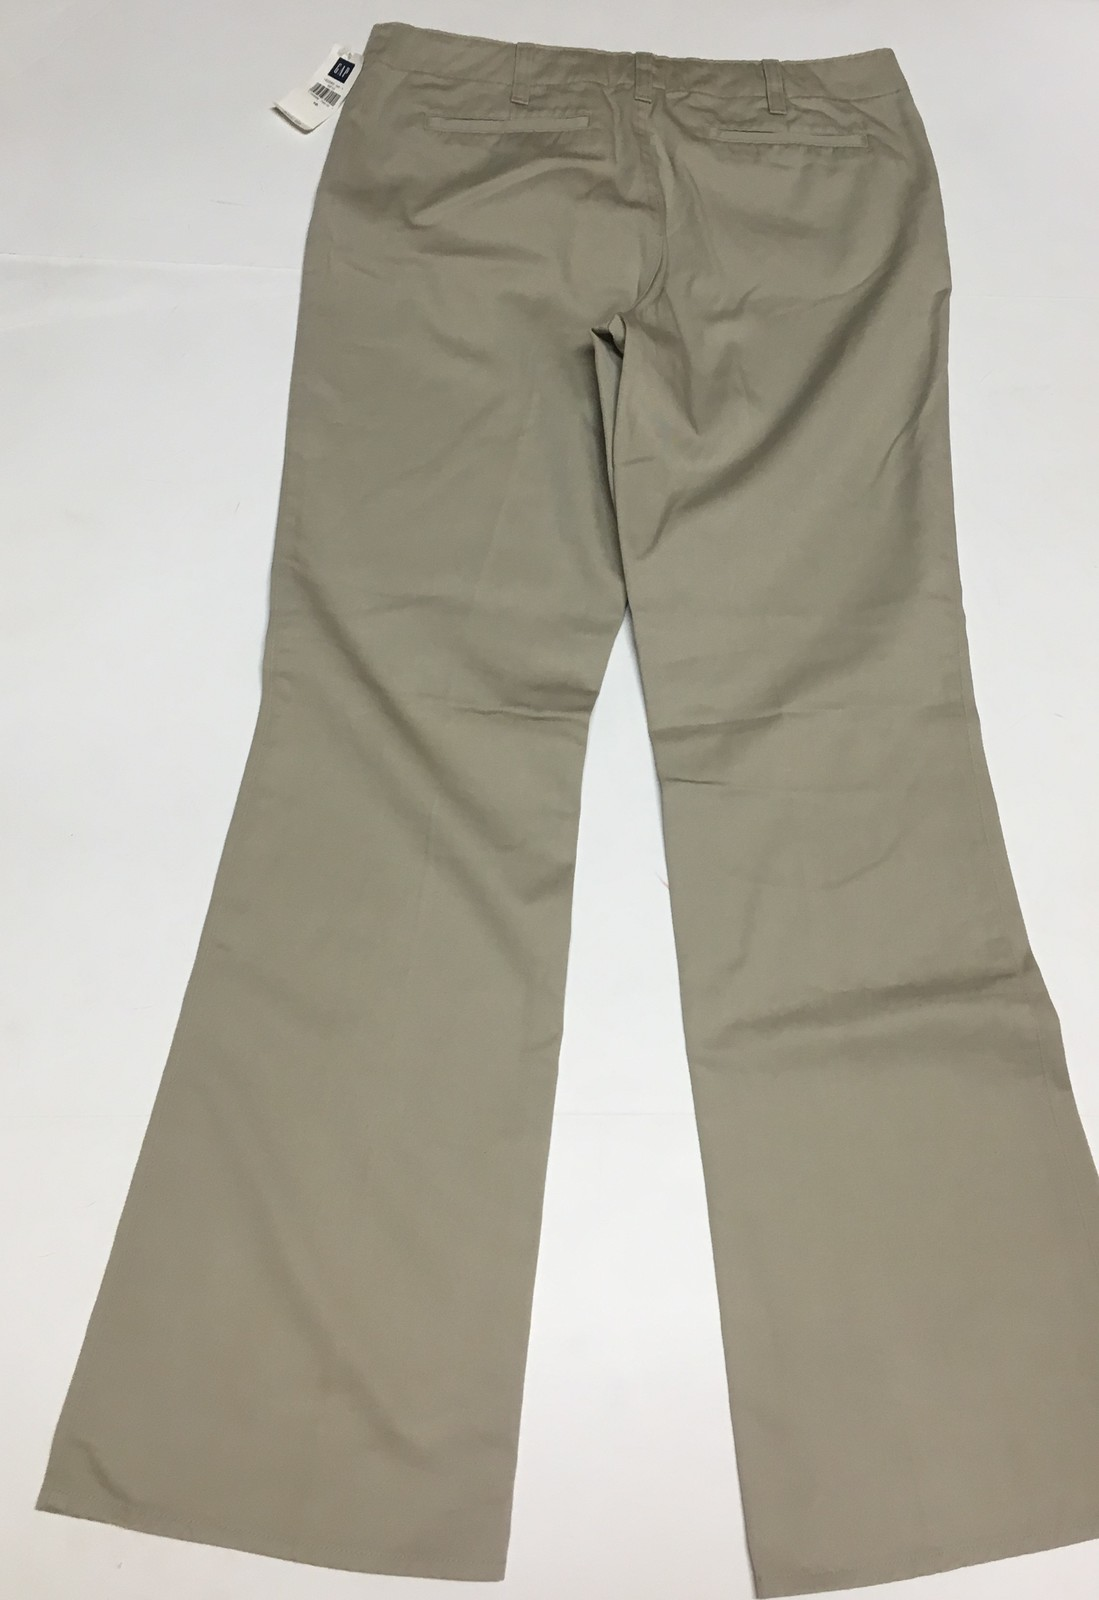 GAP Hipster Trousers Pants Beige Sz 10 image 5